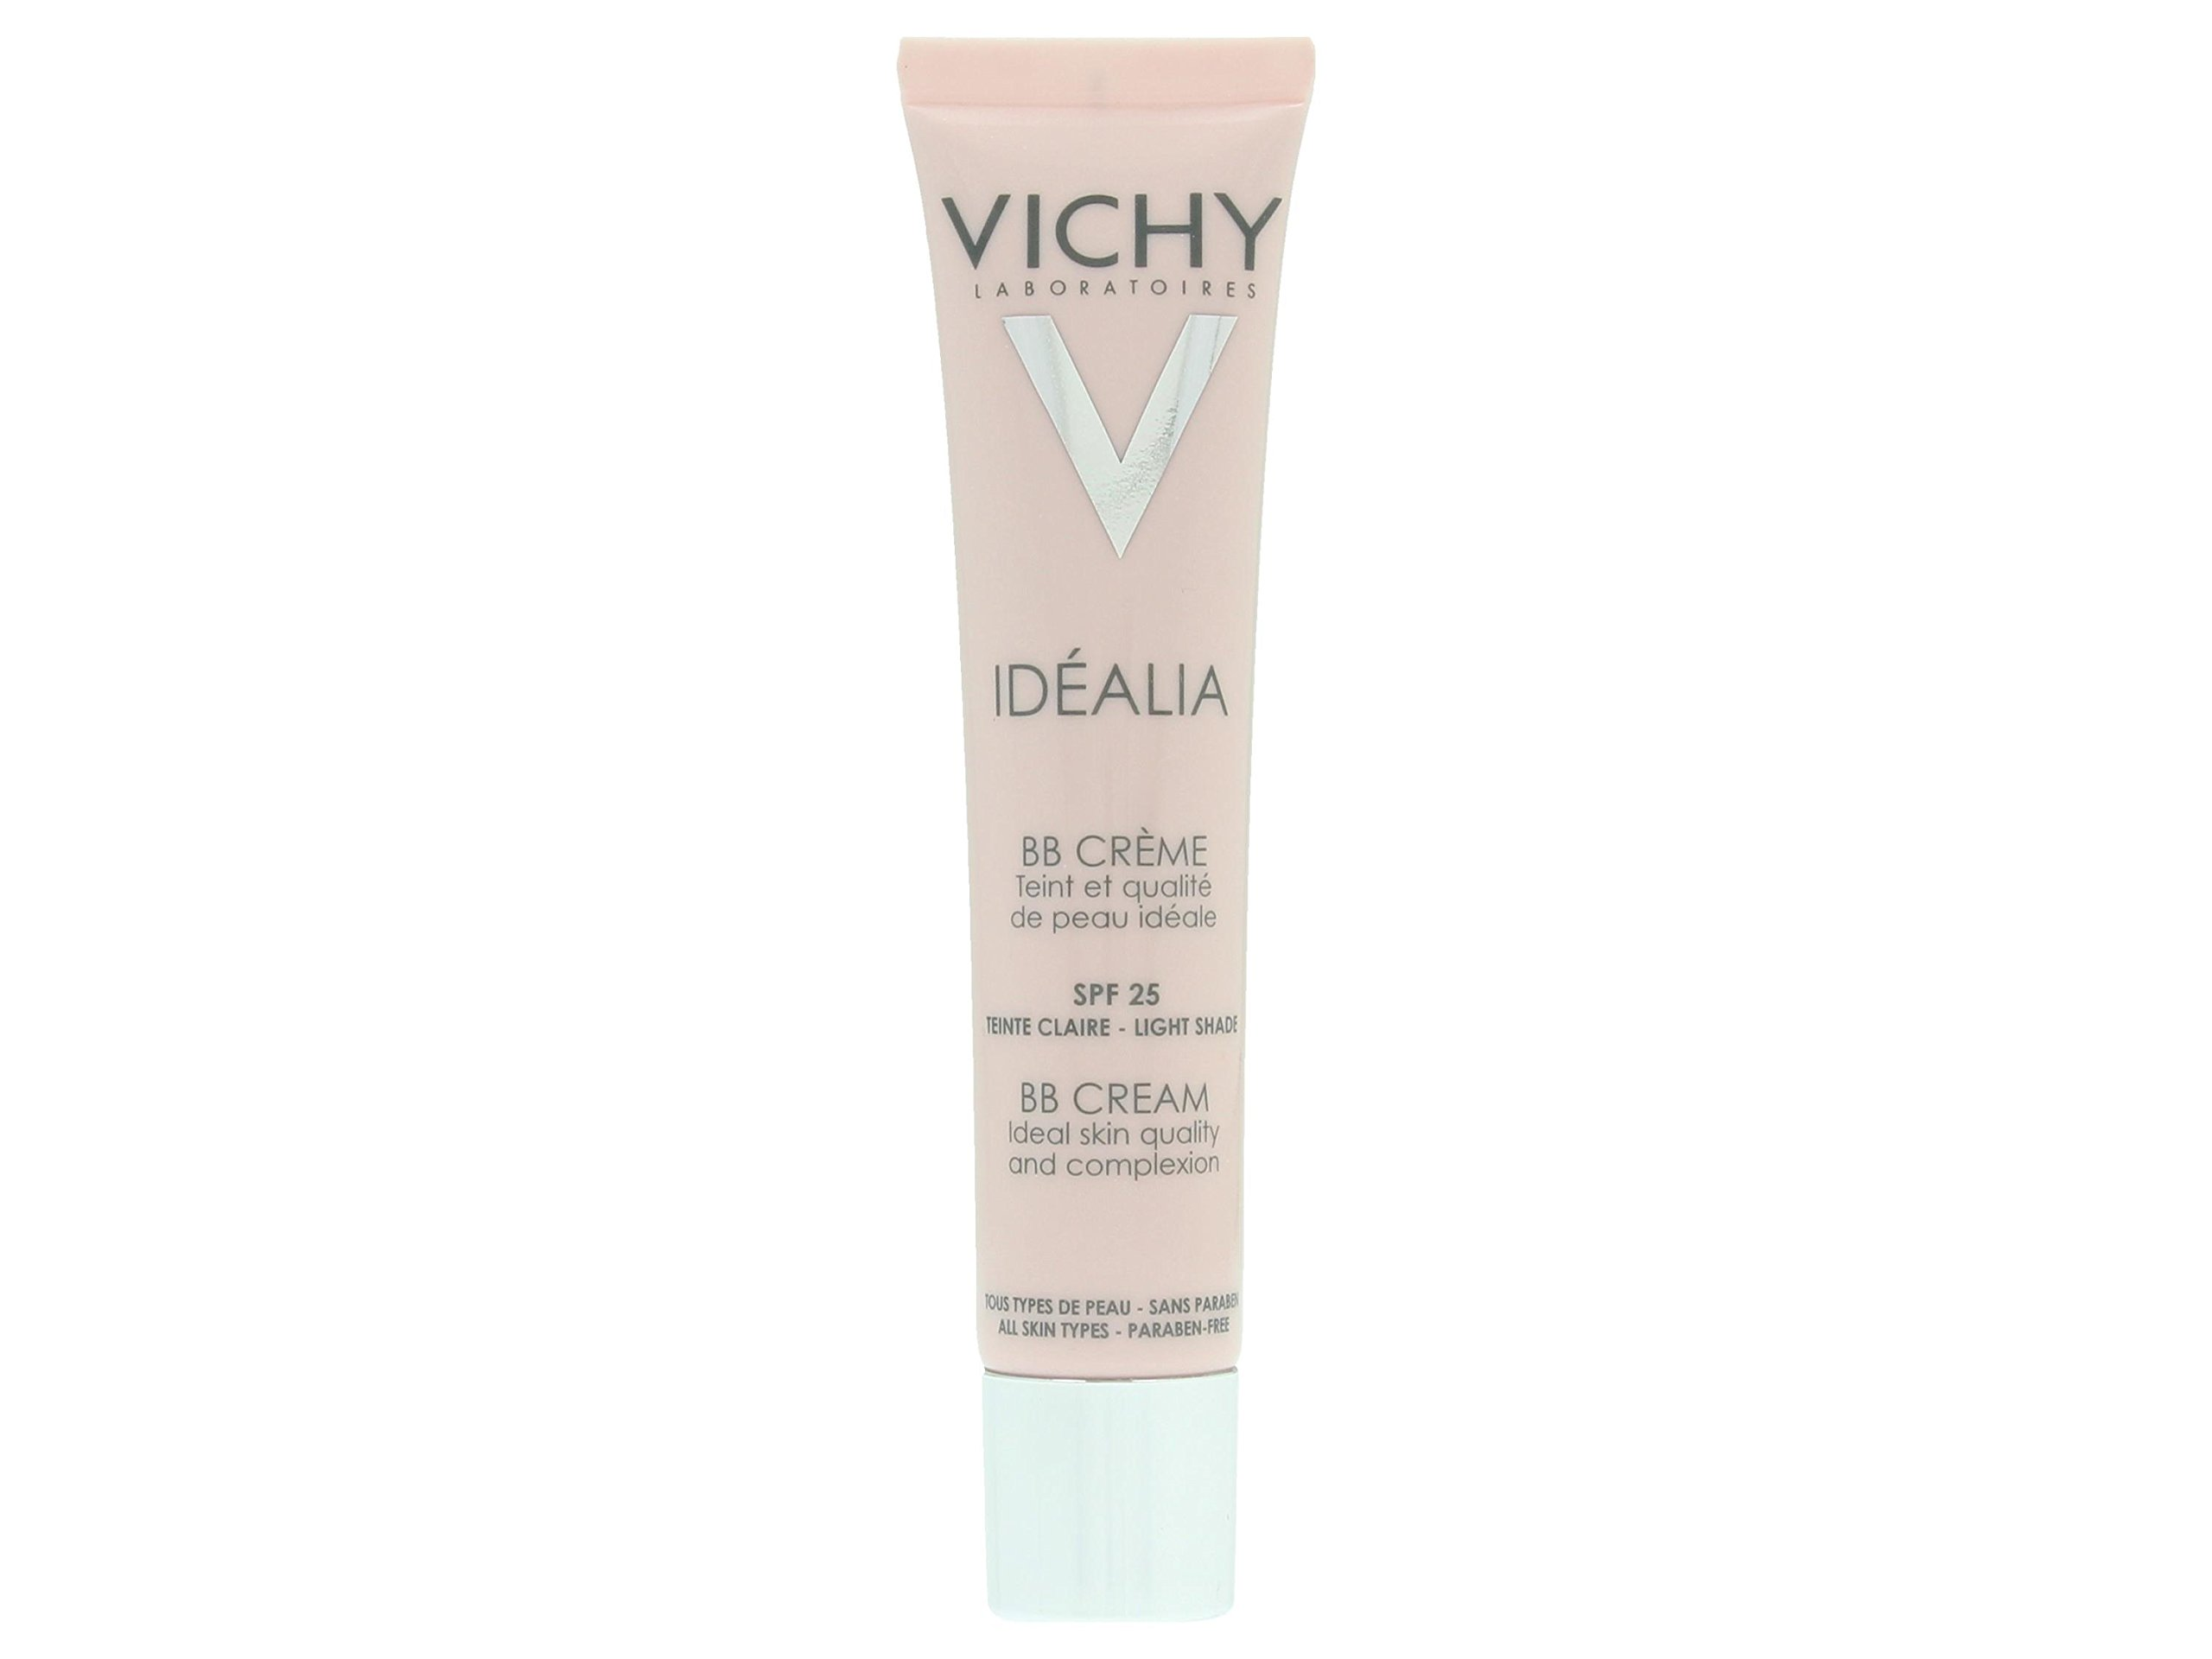 Vichy Idéalia BB SPF 25 Claire Light Shade Crema – 40 ml